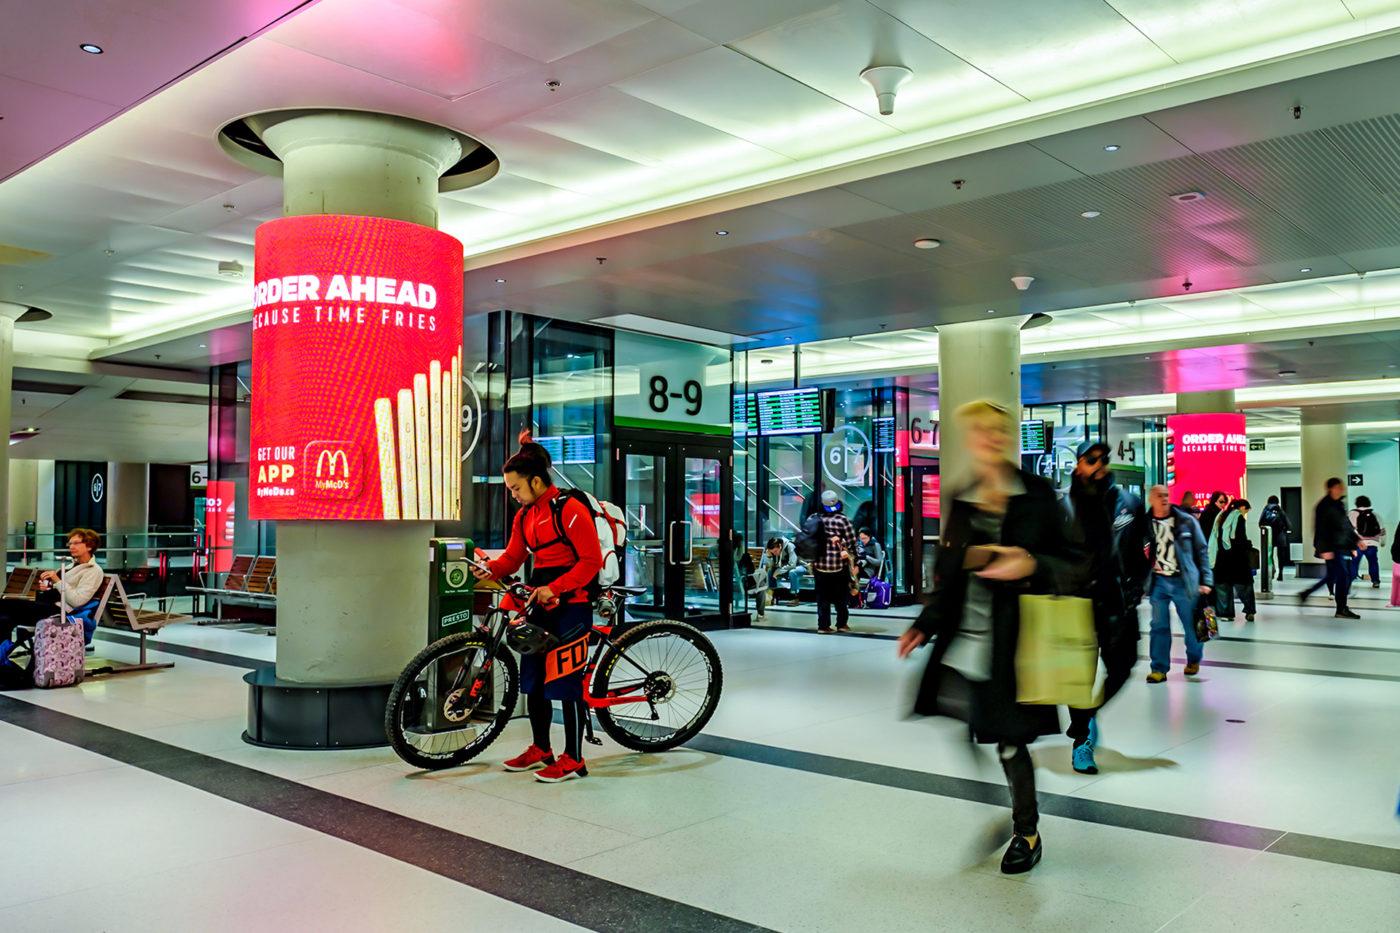 McDonald's - App - Union Station - Digital Column Wraps (Toronto, Ontario)